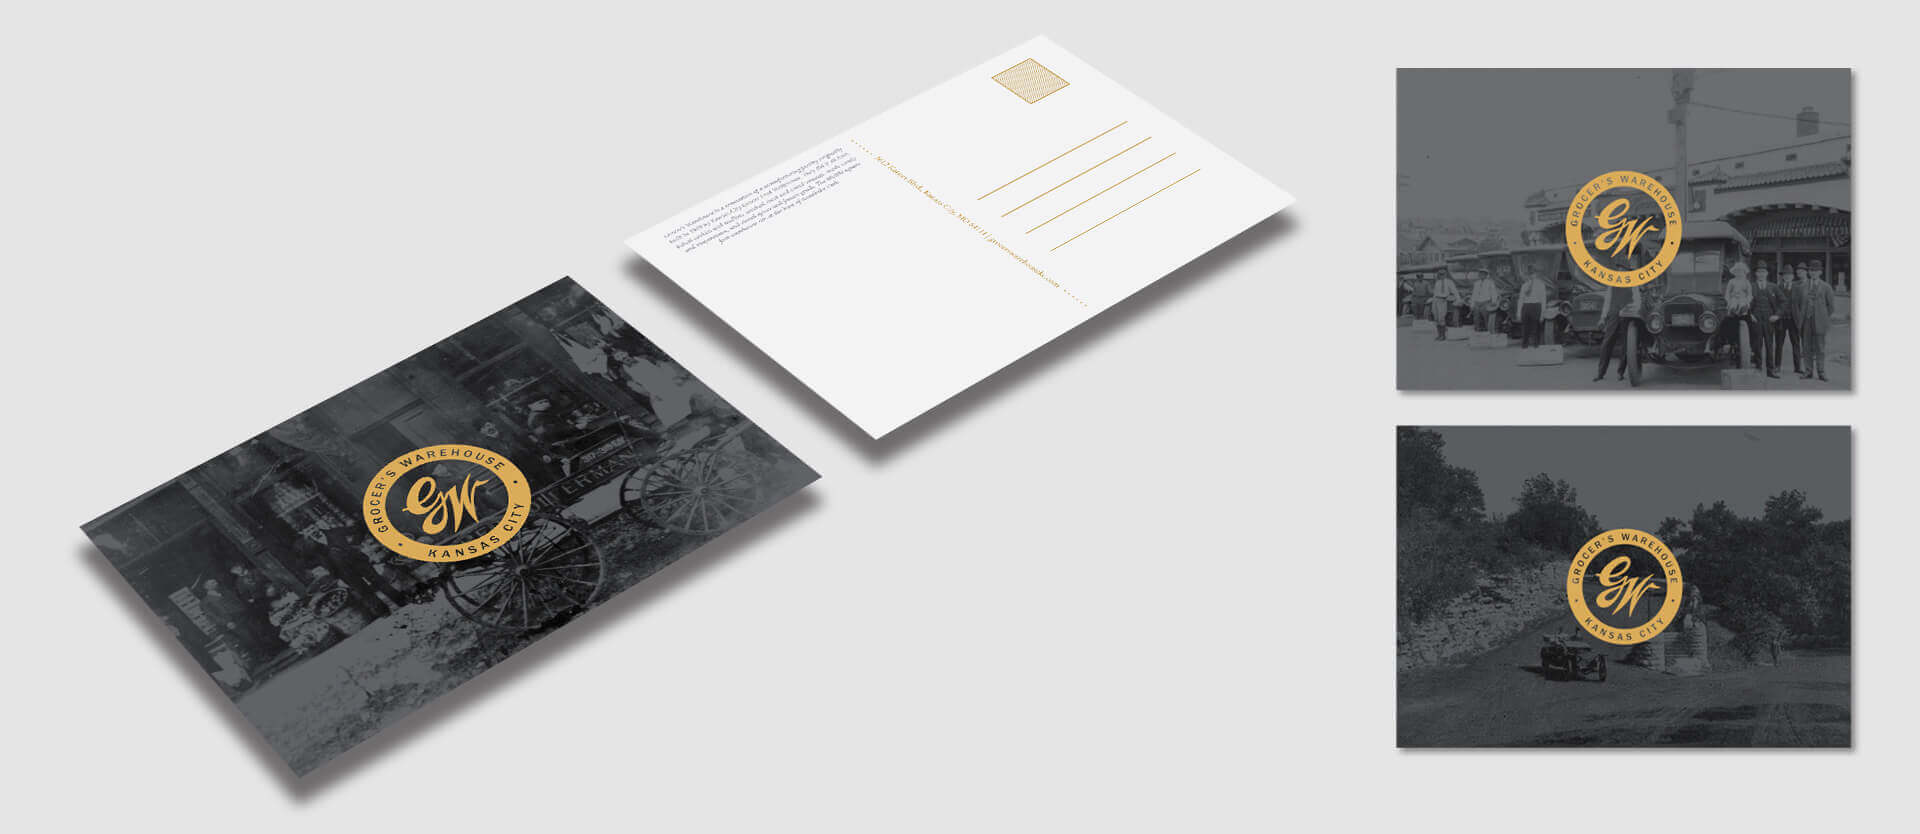 gw-postcards